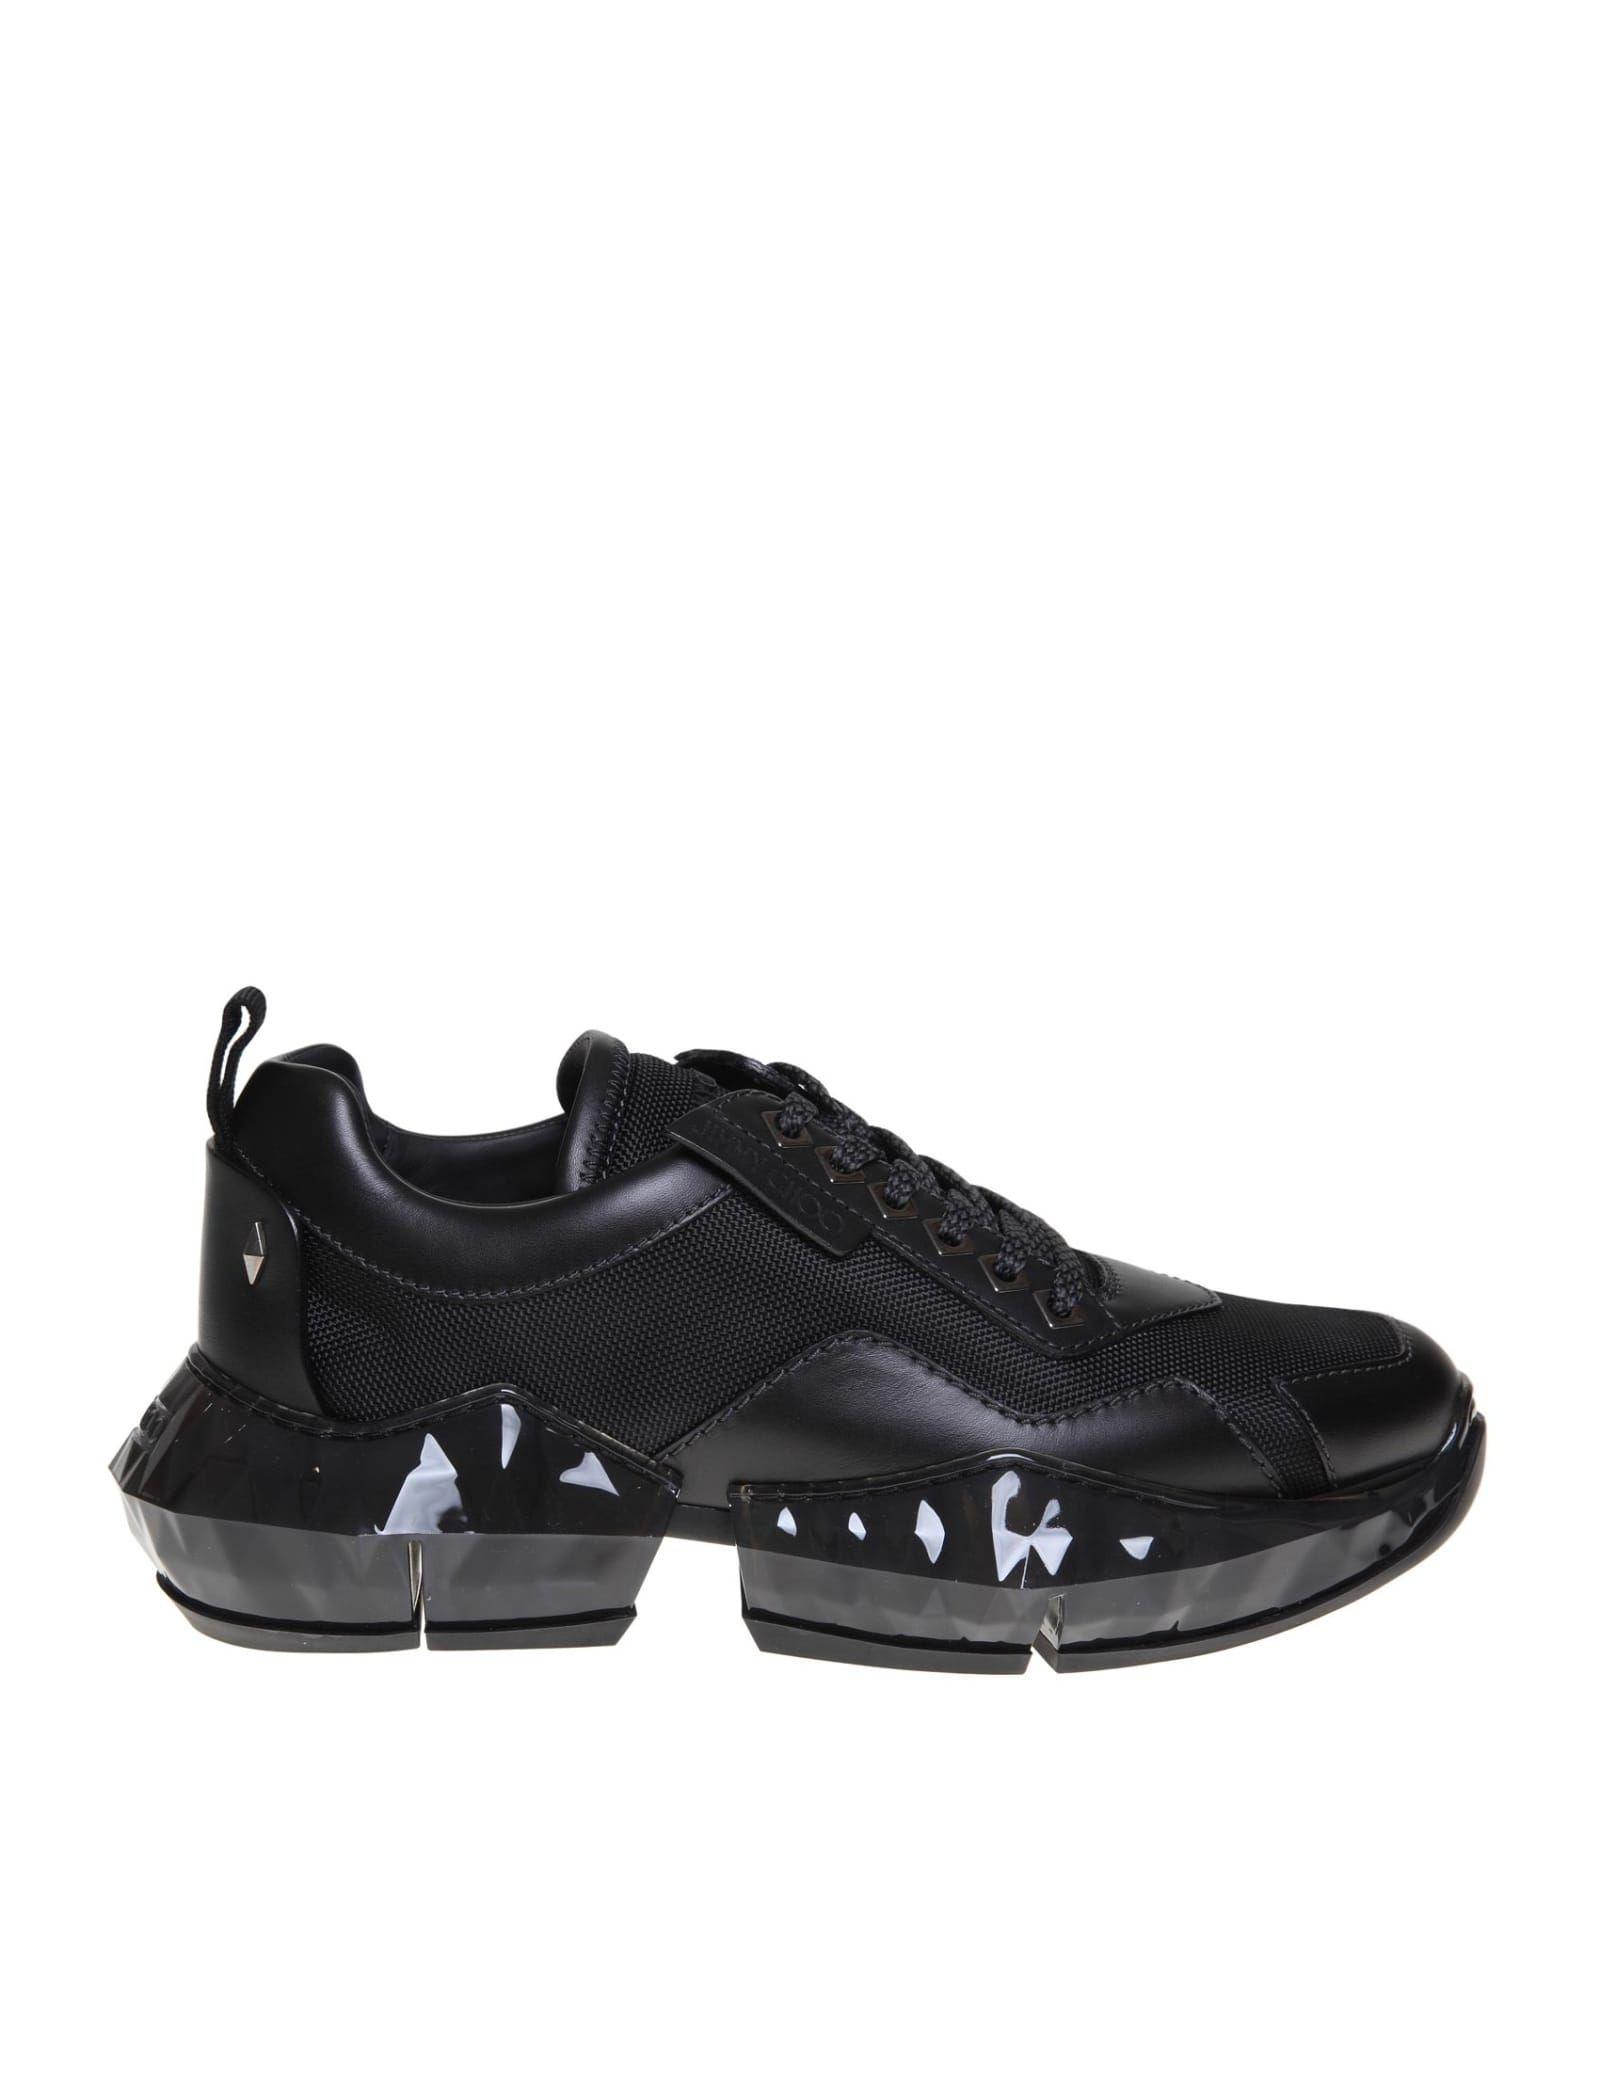 Black leather sneakers, Jimmy choo